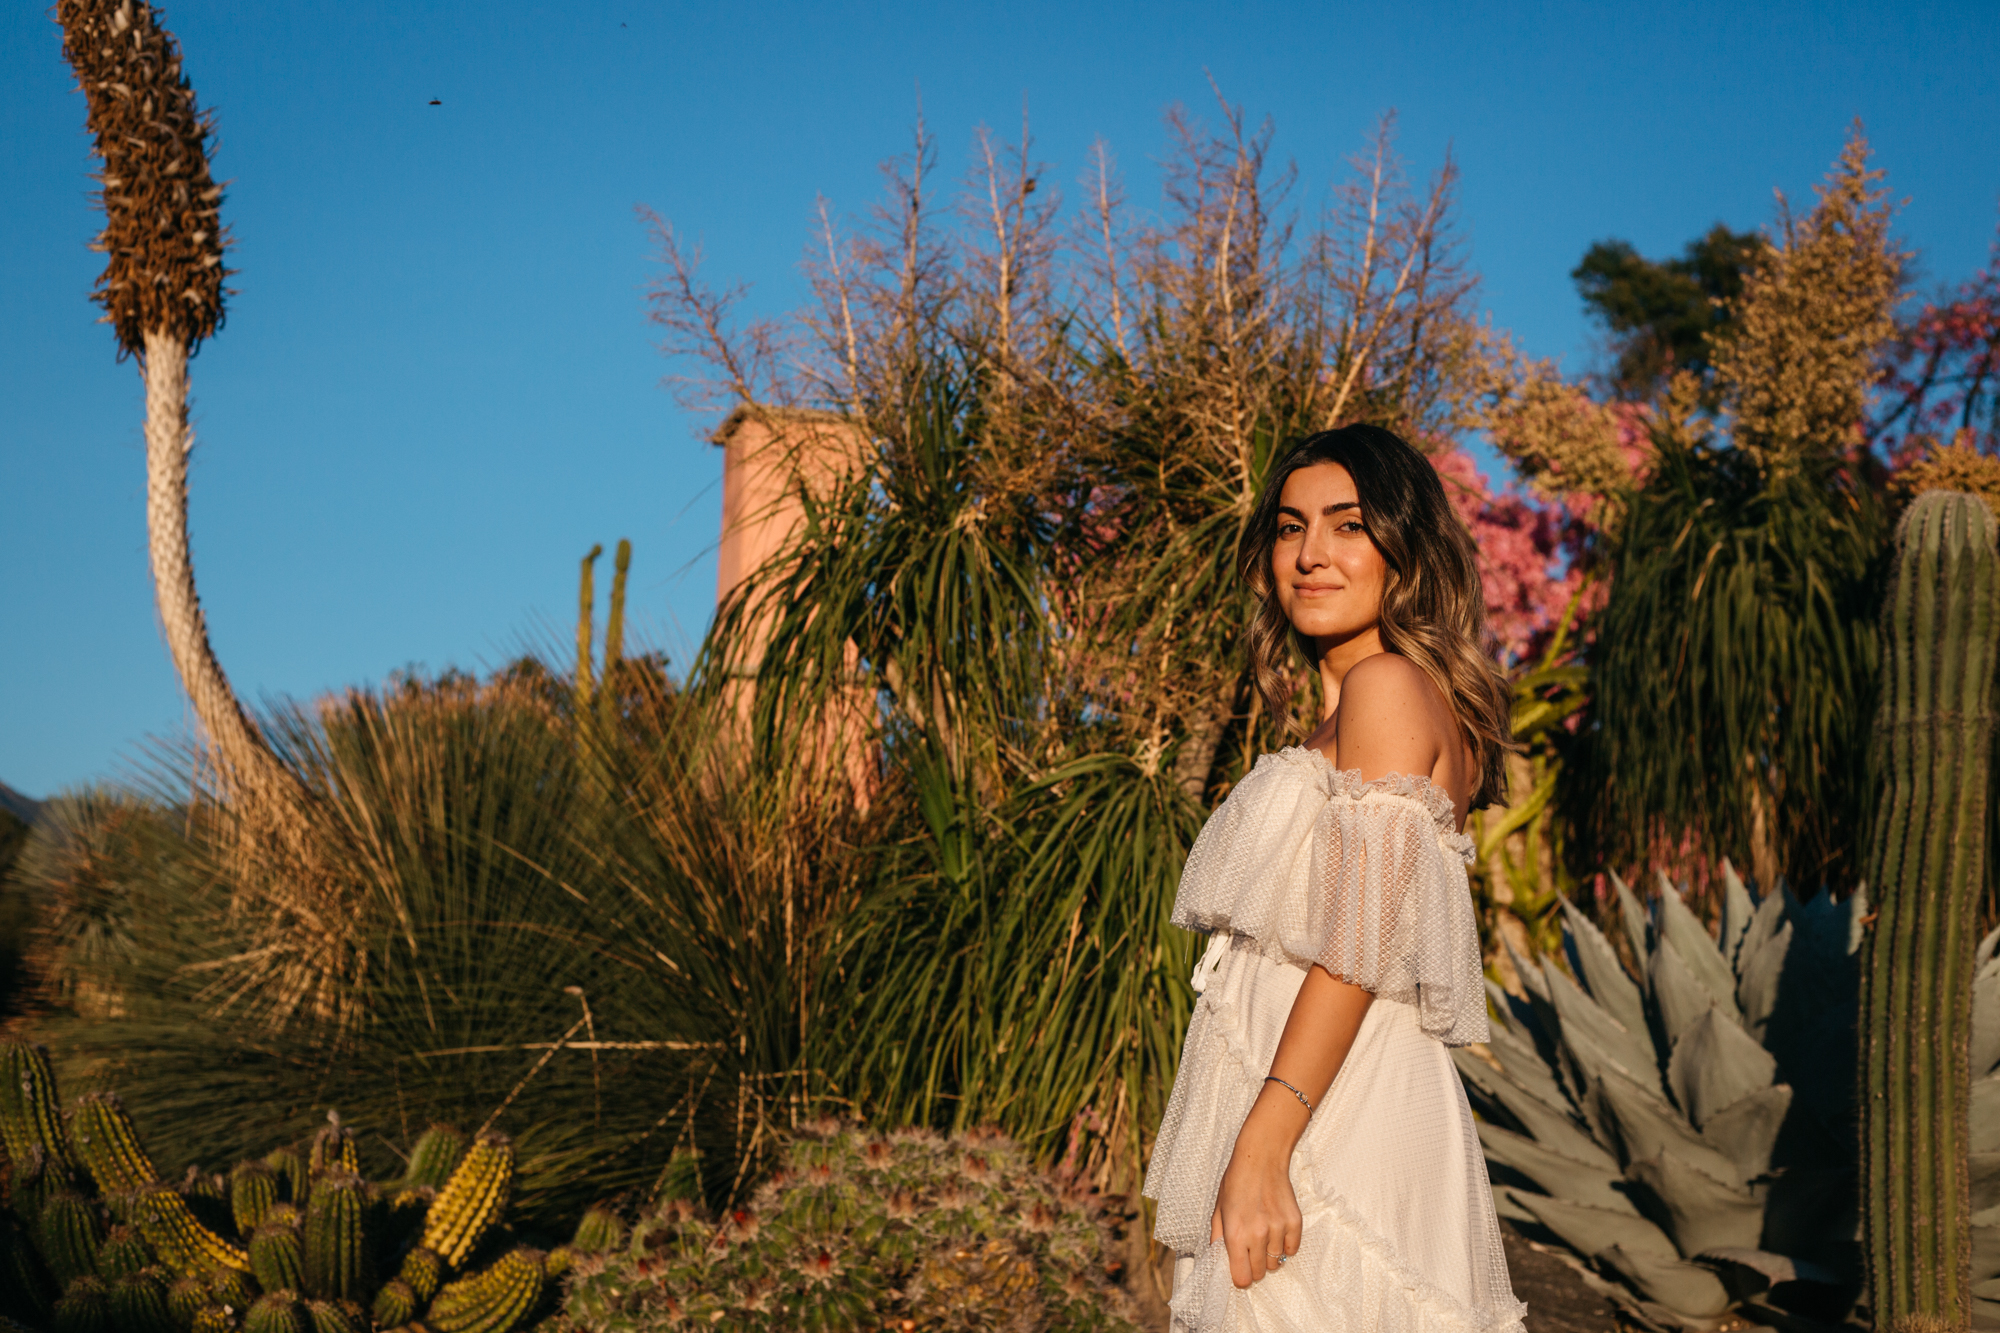 024-2018-LA-arboretum.jpg